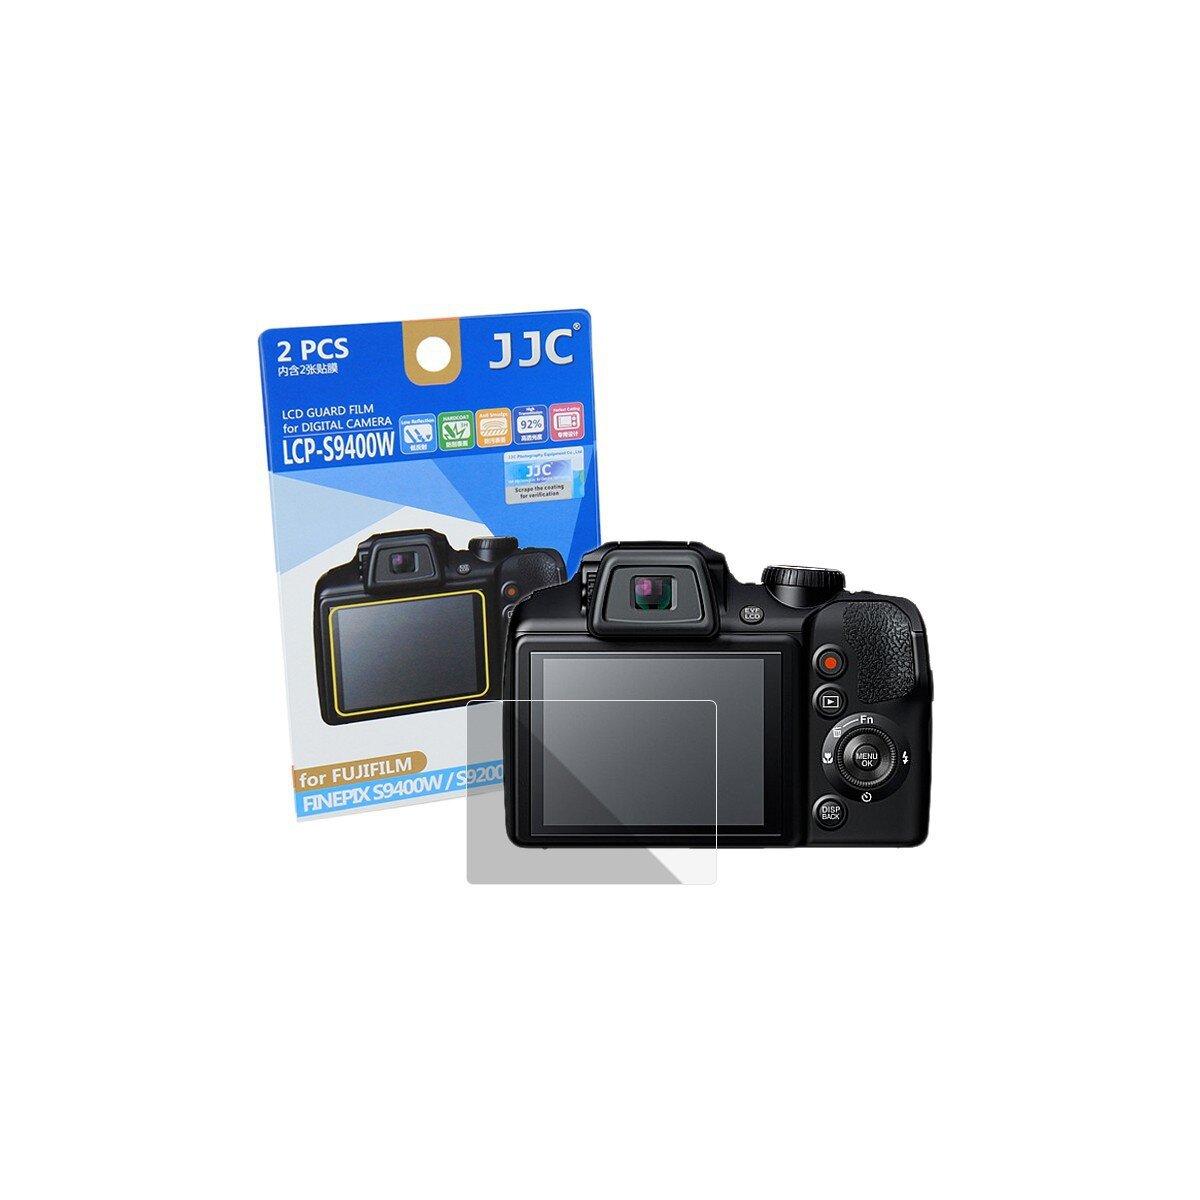 JJC Displayschutzfolie Screen Protector Kratzschutz passgenau kompatibel für Fujifilm Finepix S9400W - LCP-S9400W